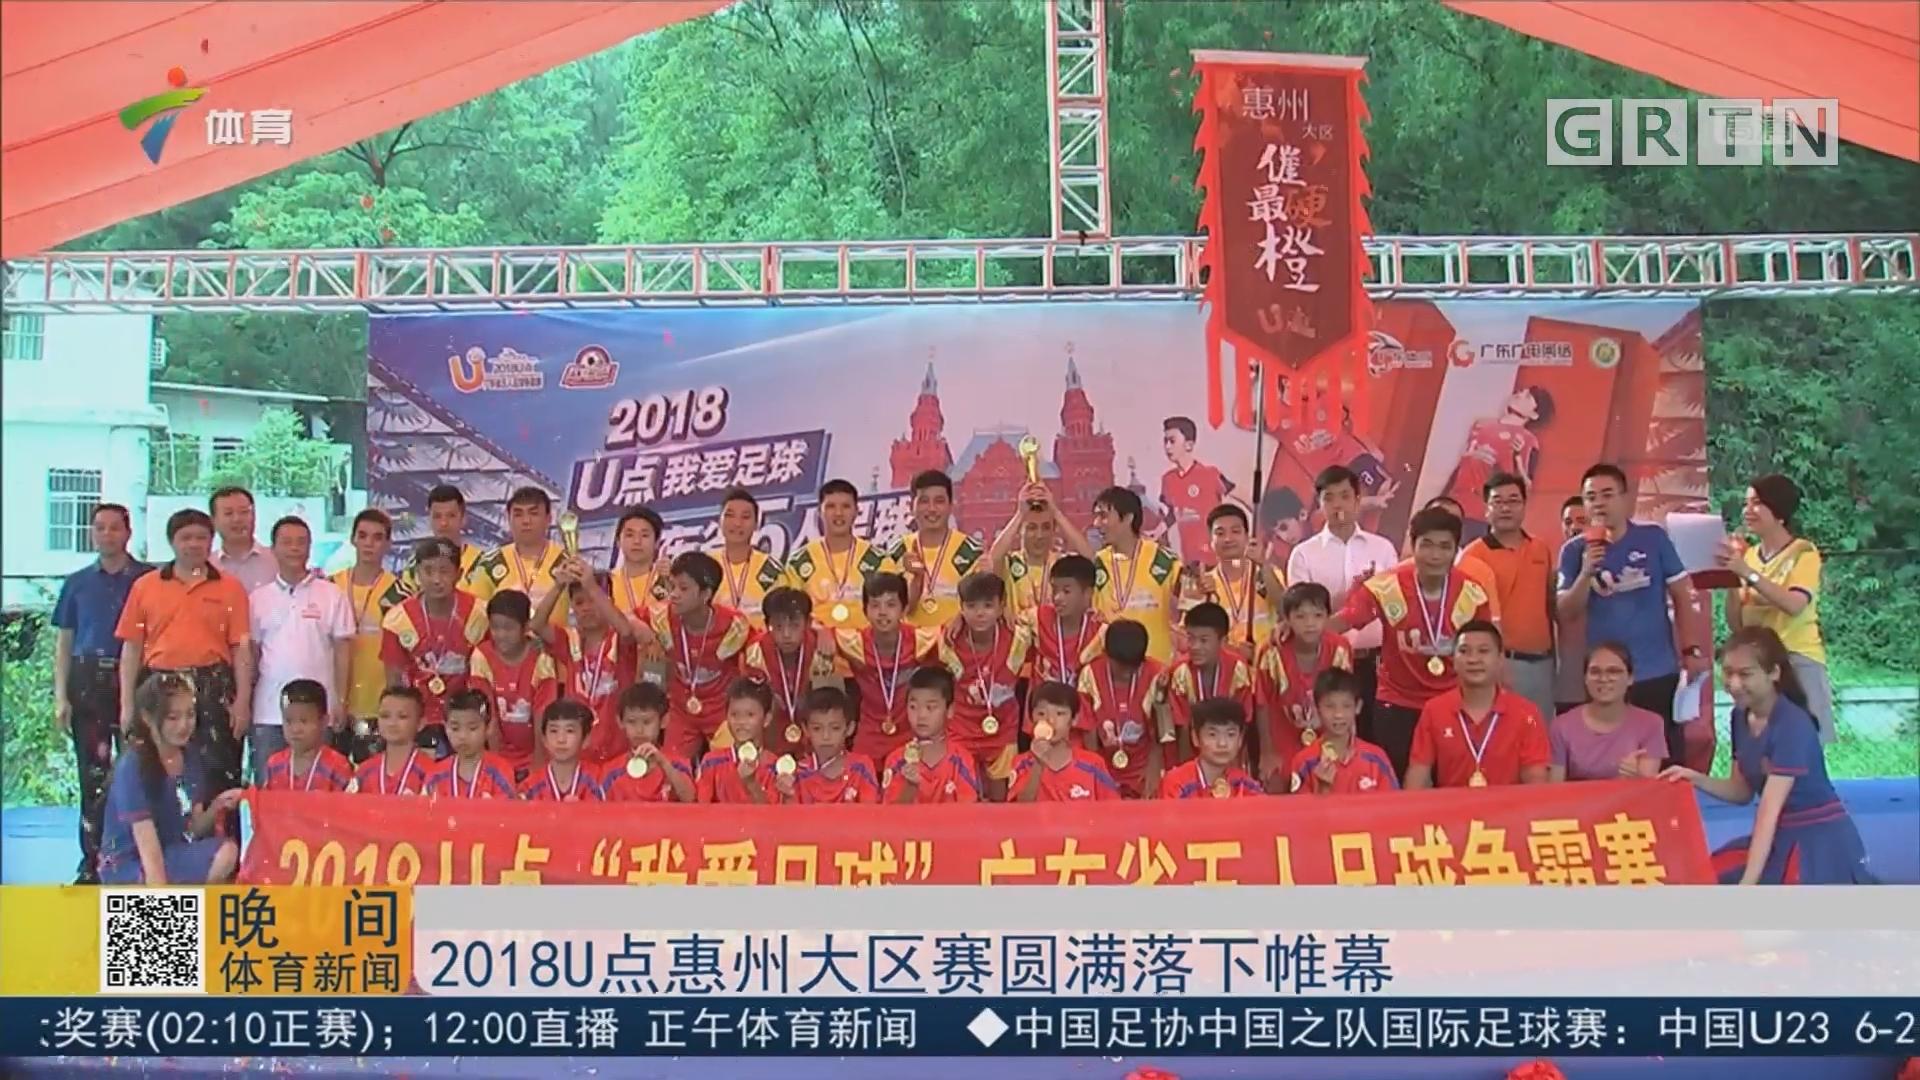 2018U点惠州大区赛圆满落下帷幕